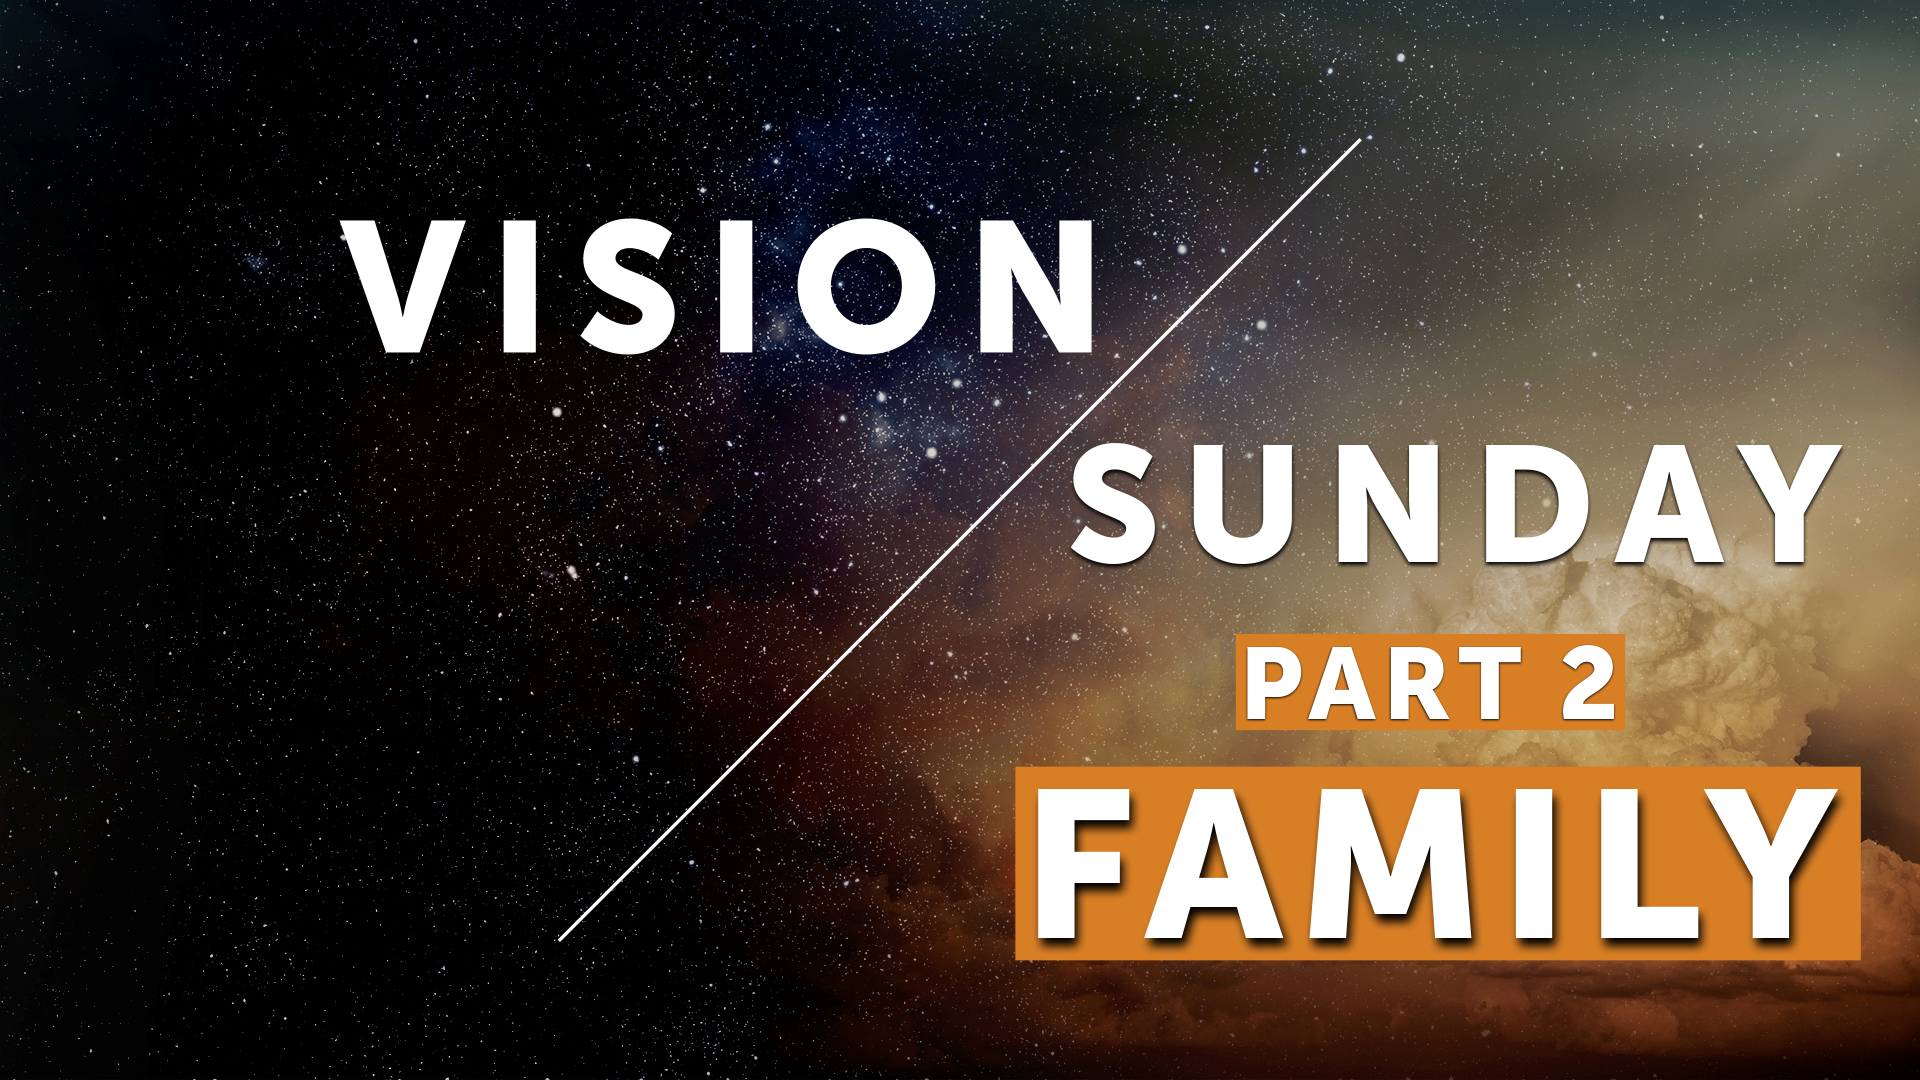 Vision Sunday - Part 2